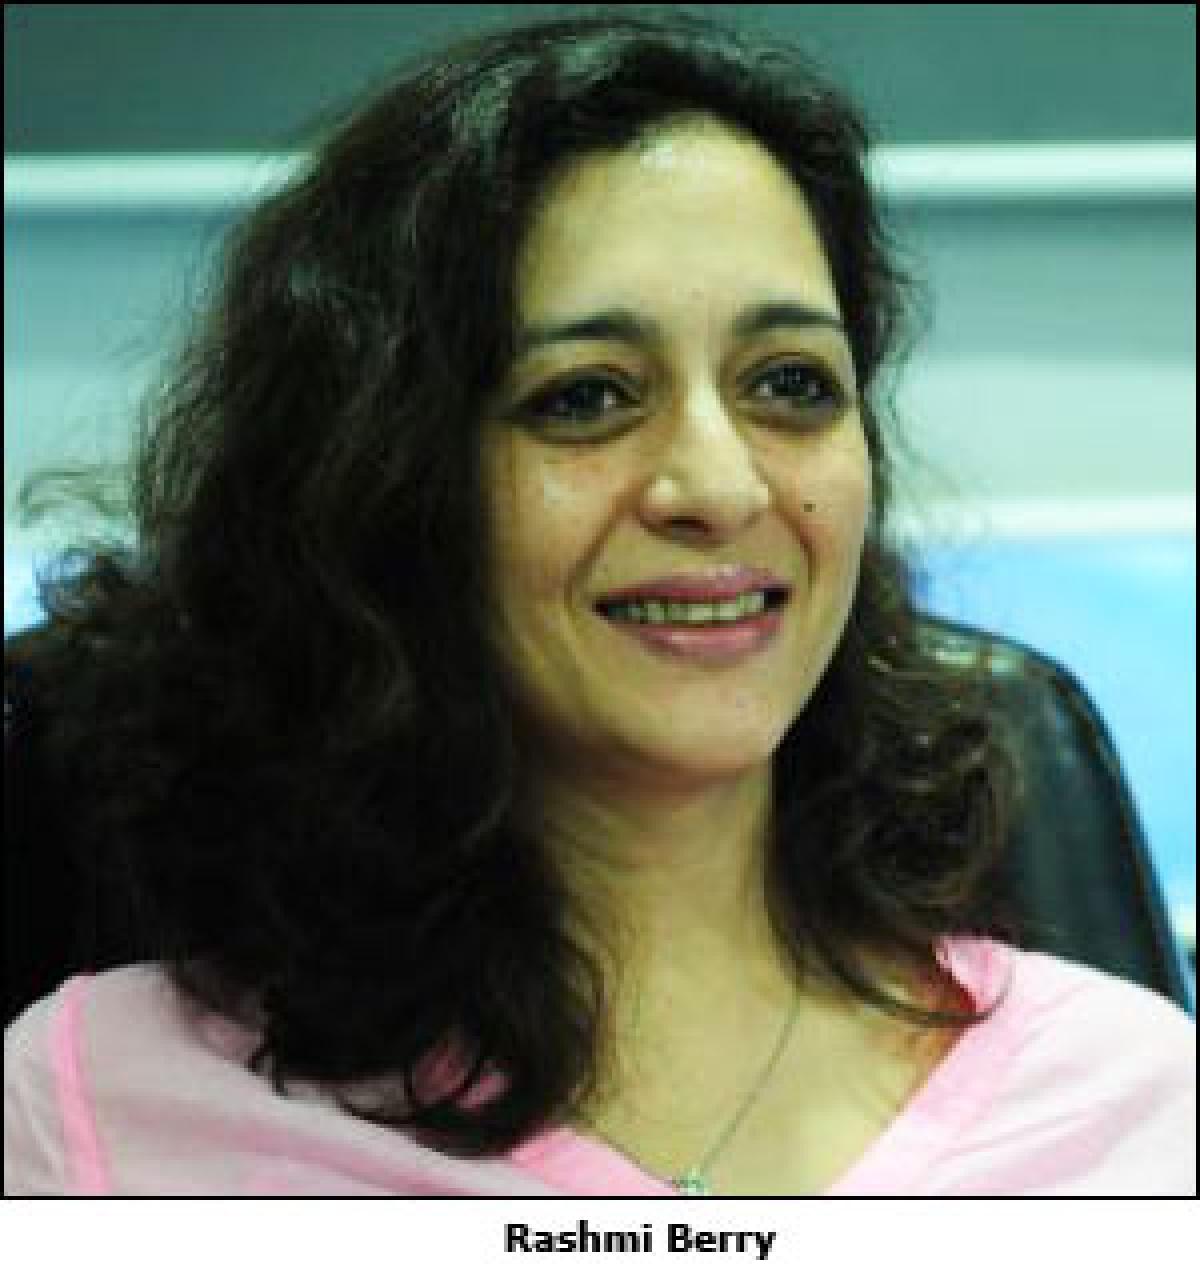 Rashmi Berry and Mona Rai launch Brand Story Consult